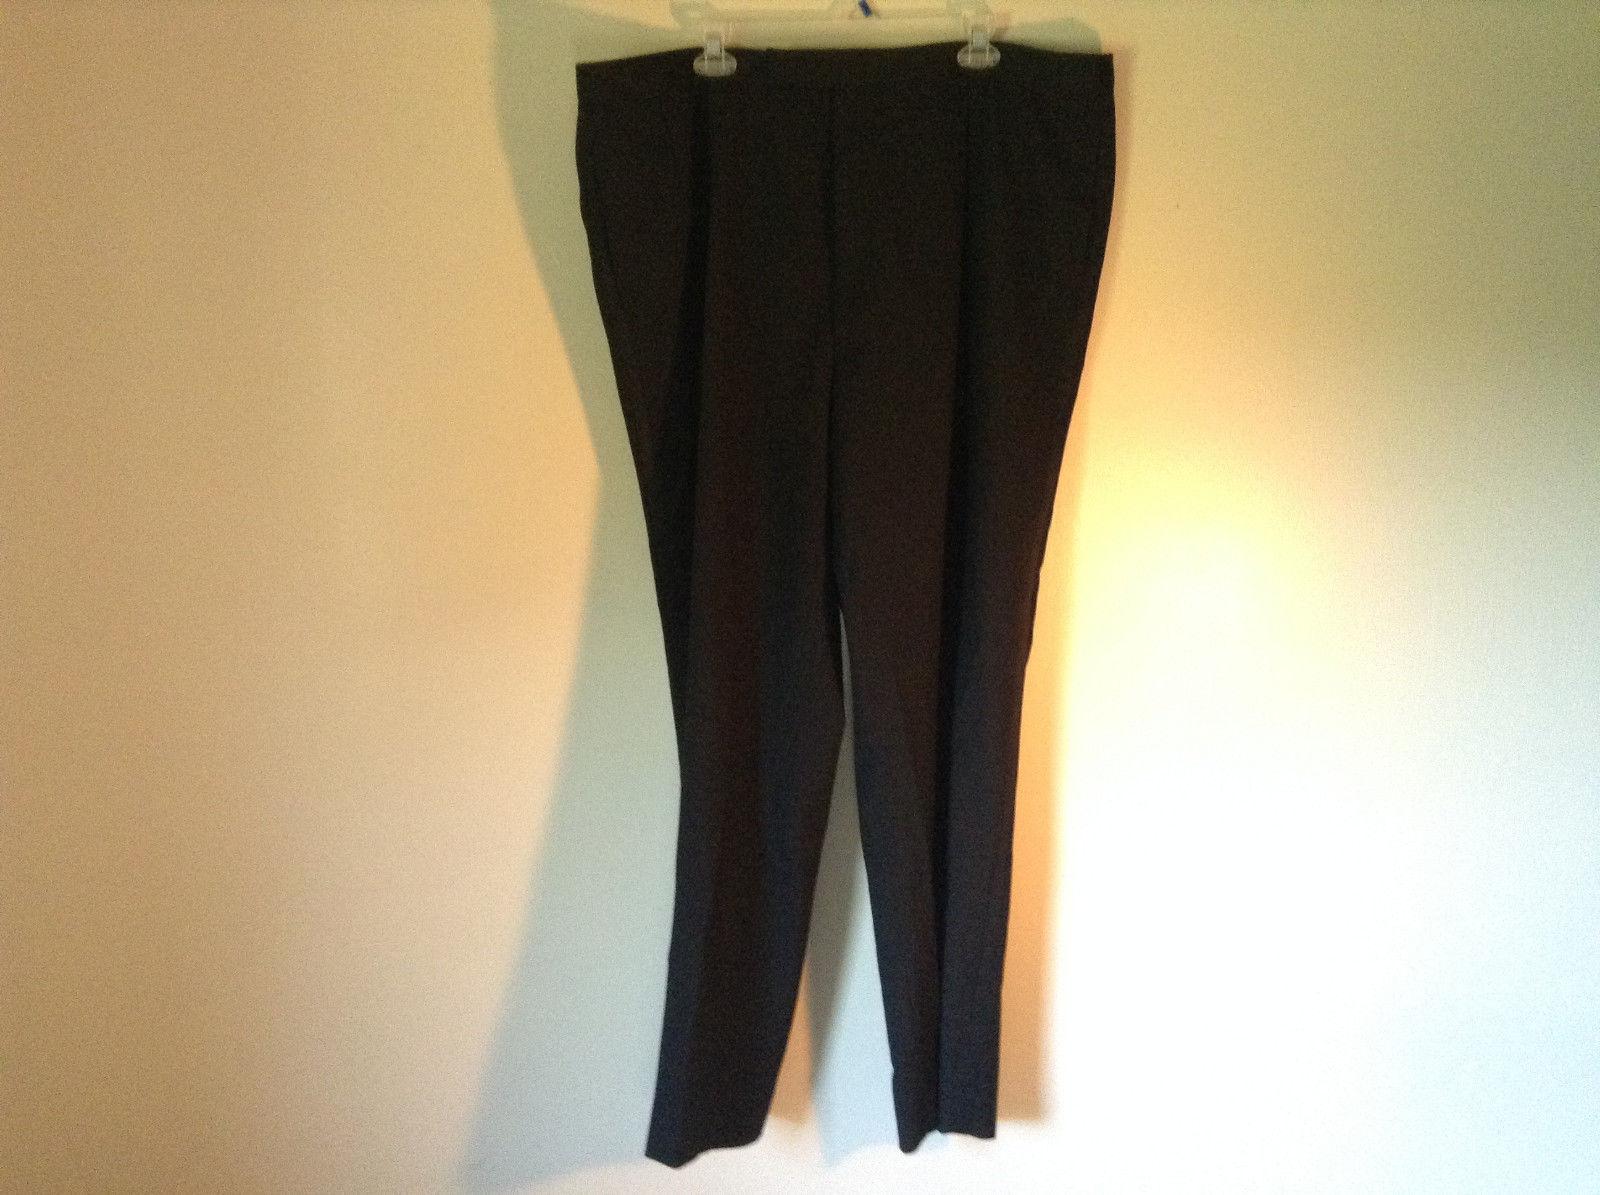 Black Pleated Dress Pants NO TAGS See Measurements Below